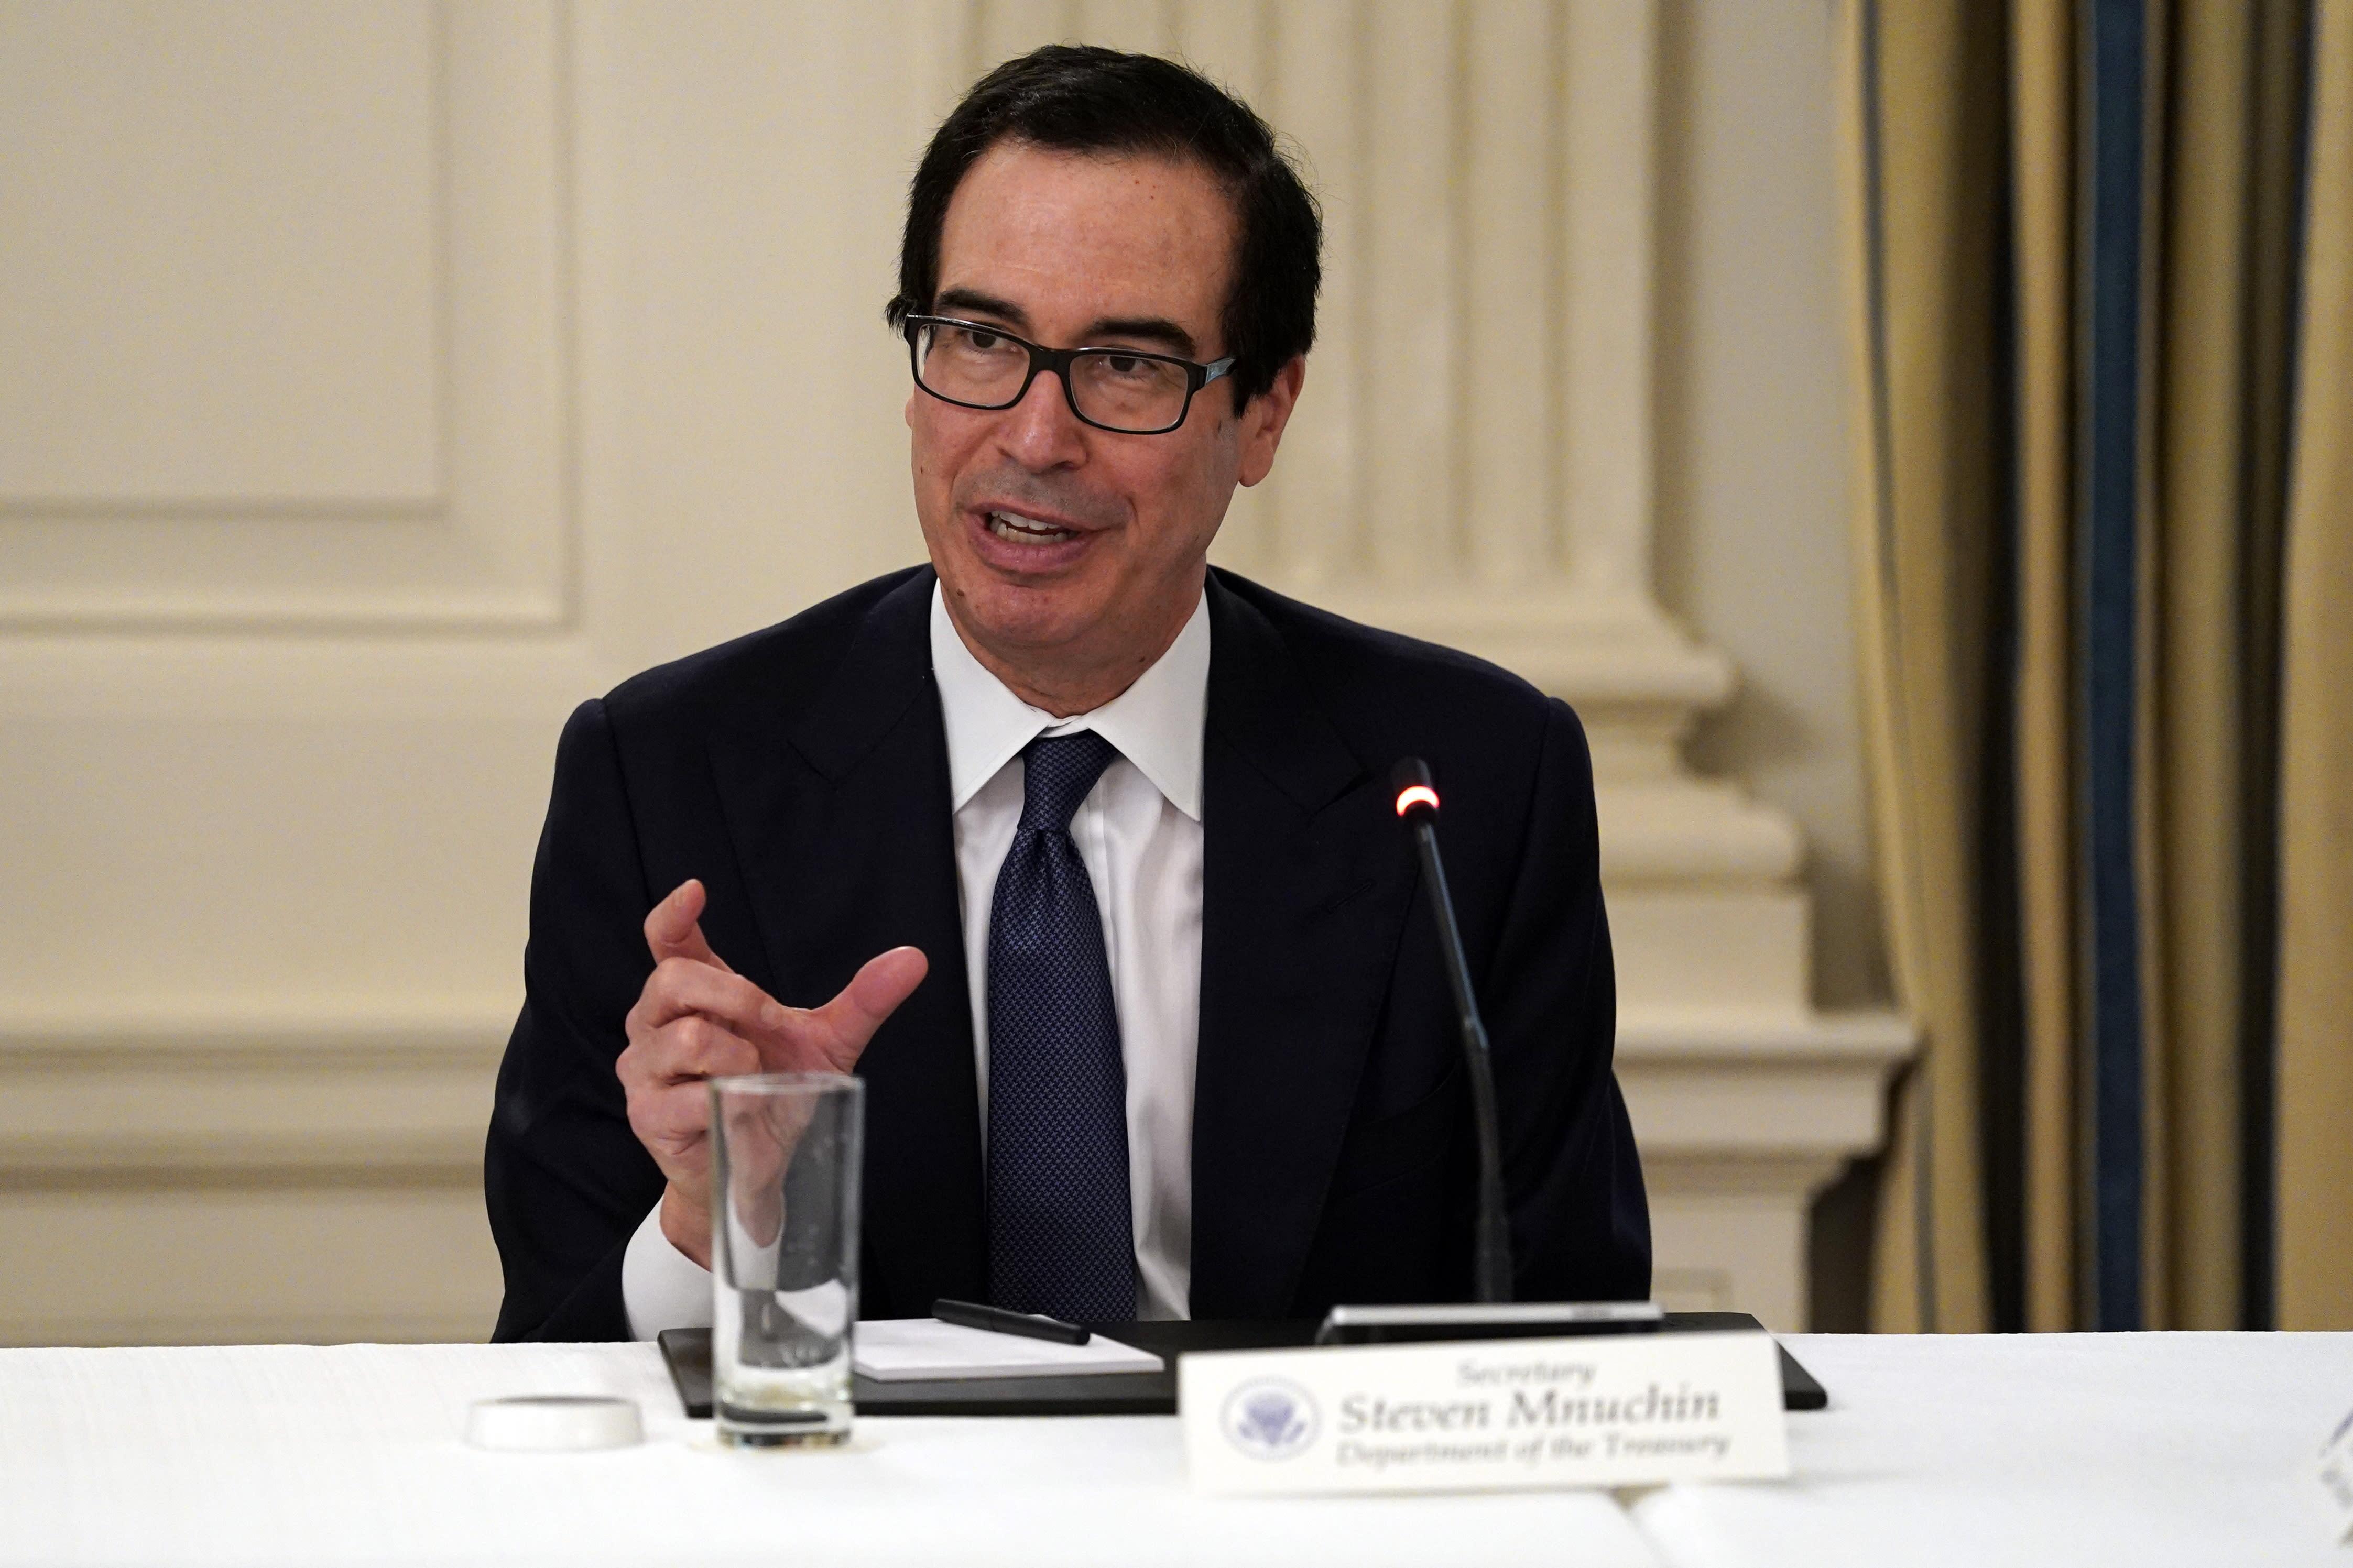 Fed, Treasury have failed to protect jobs so far: oversight panel member